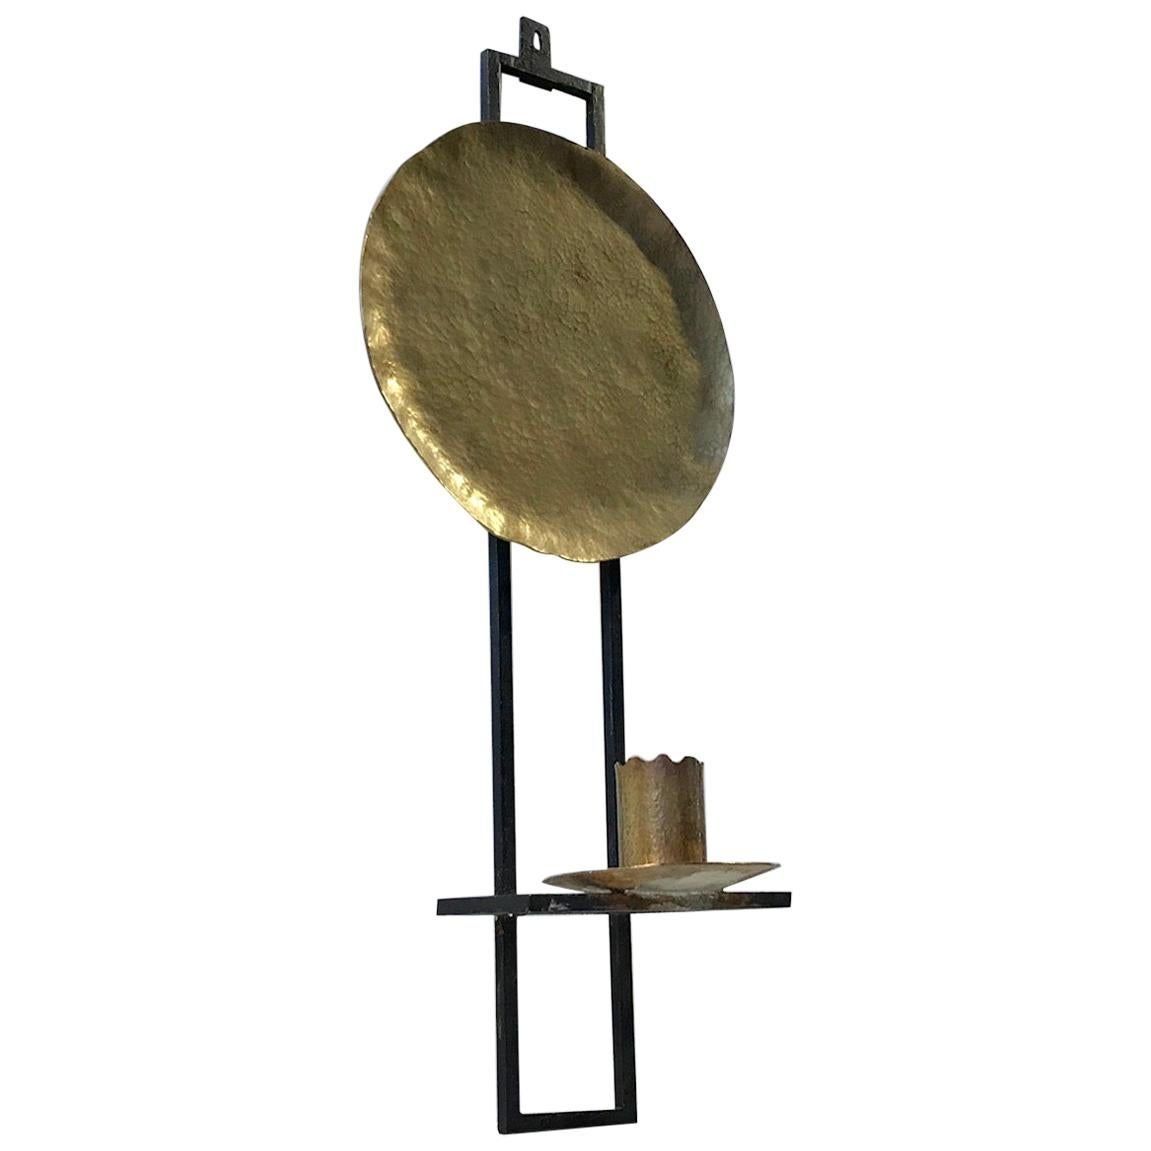 Scandinavian Wall Hung Candleholder in Brass and Wrought Iron, 1950s